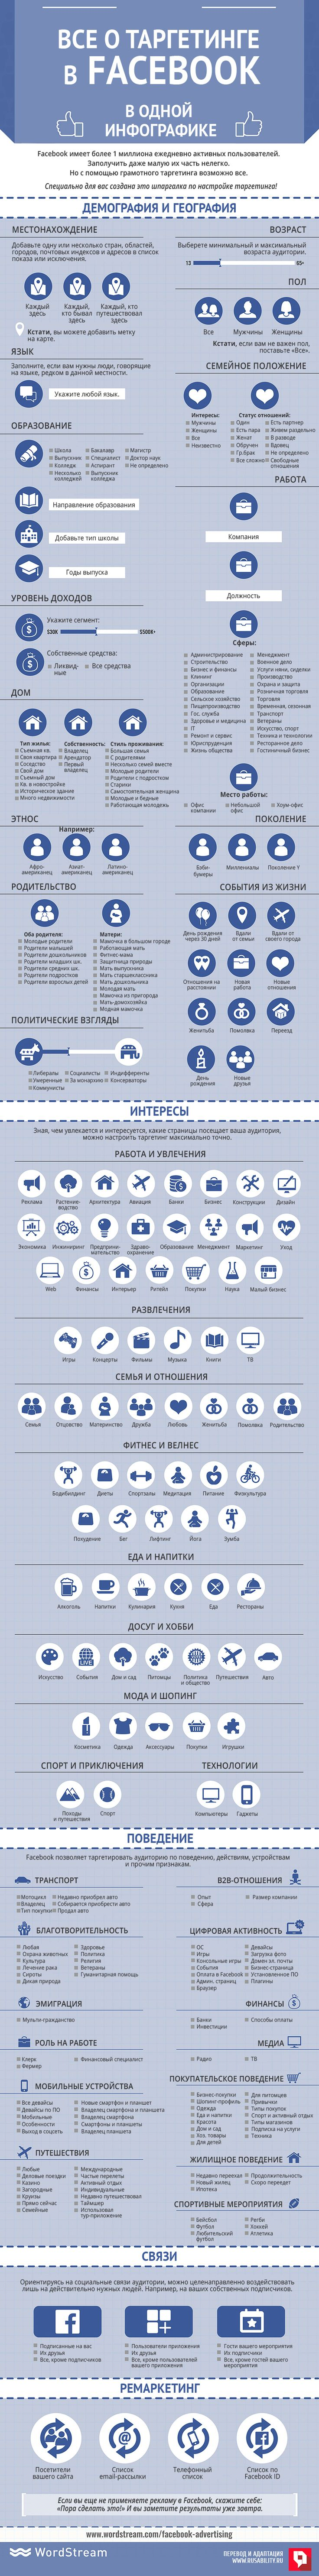 таргетинг, аудитория, маркетинг, реклама, Facebook, ads, инфографика